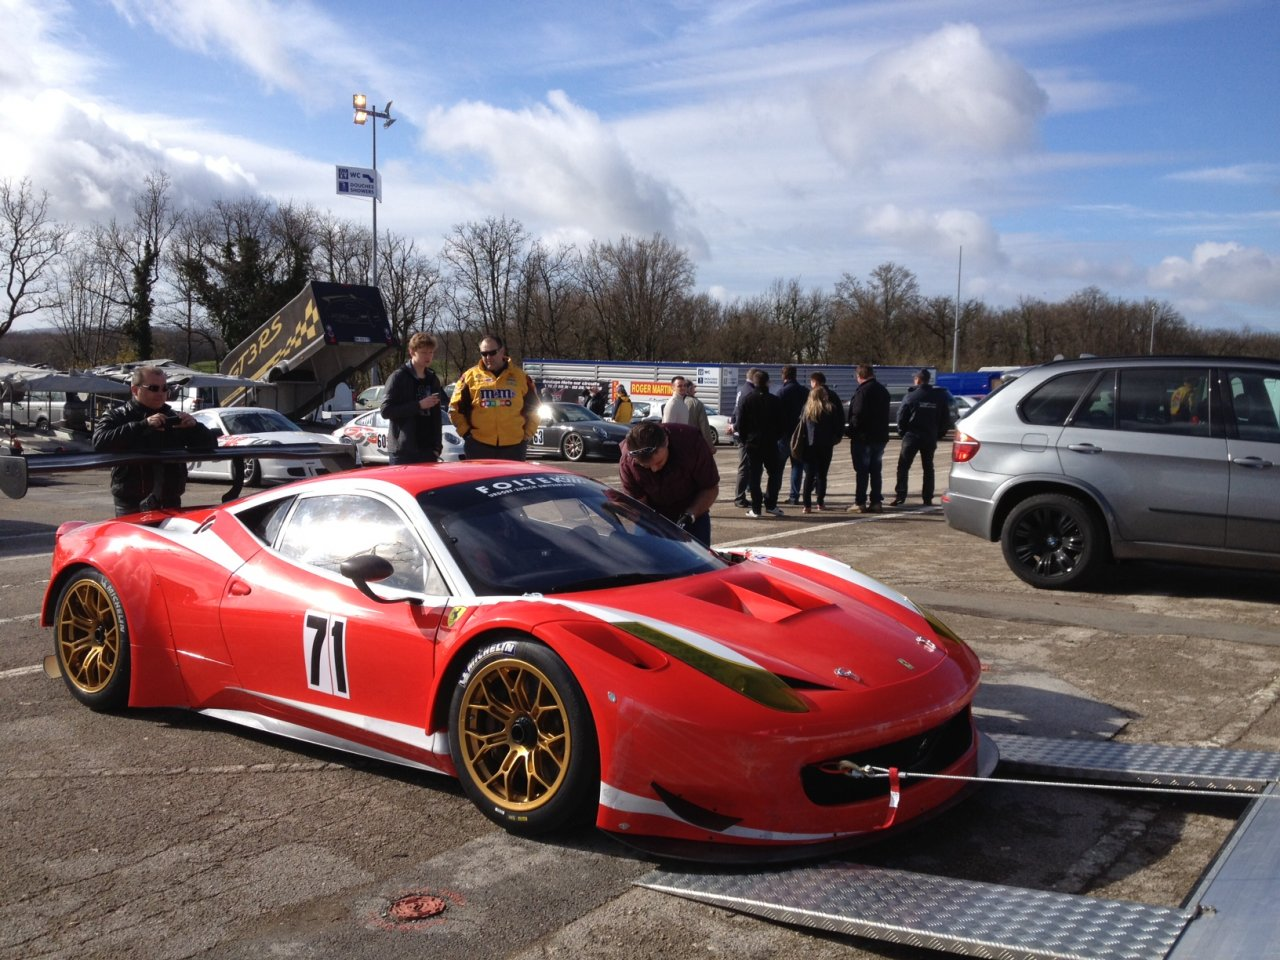 Ferrari 458 FIA GT3